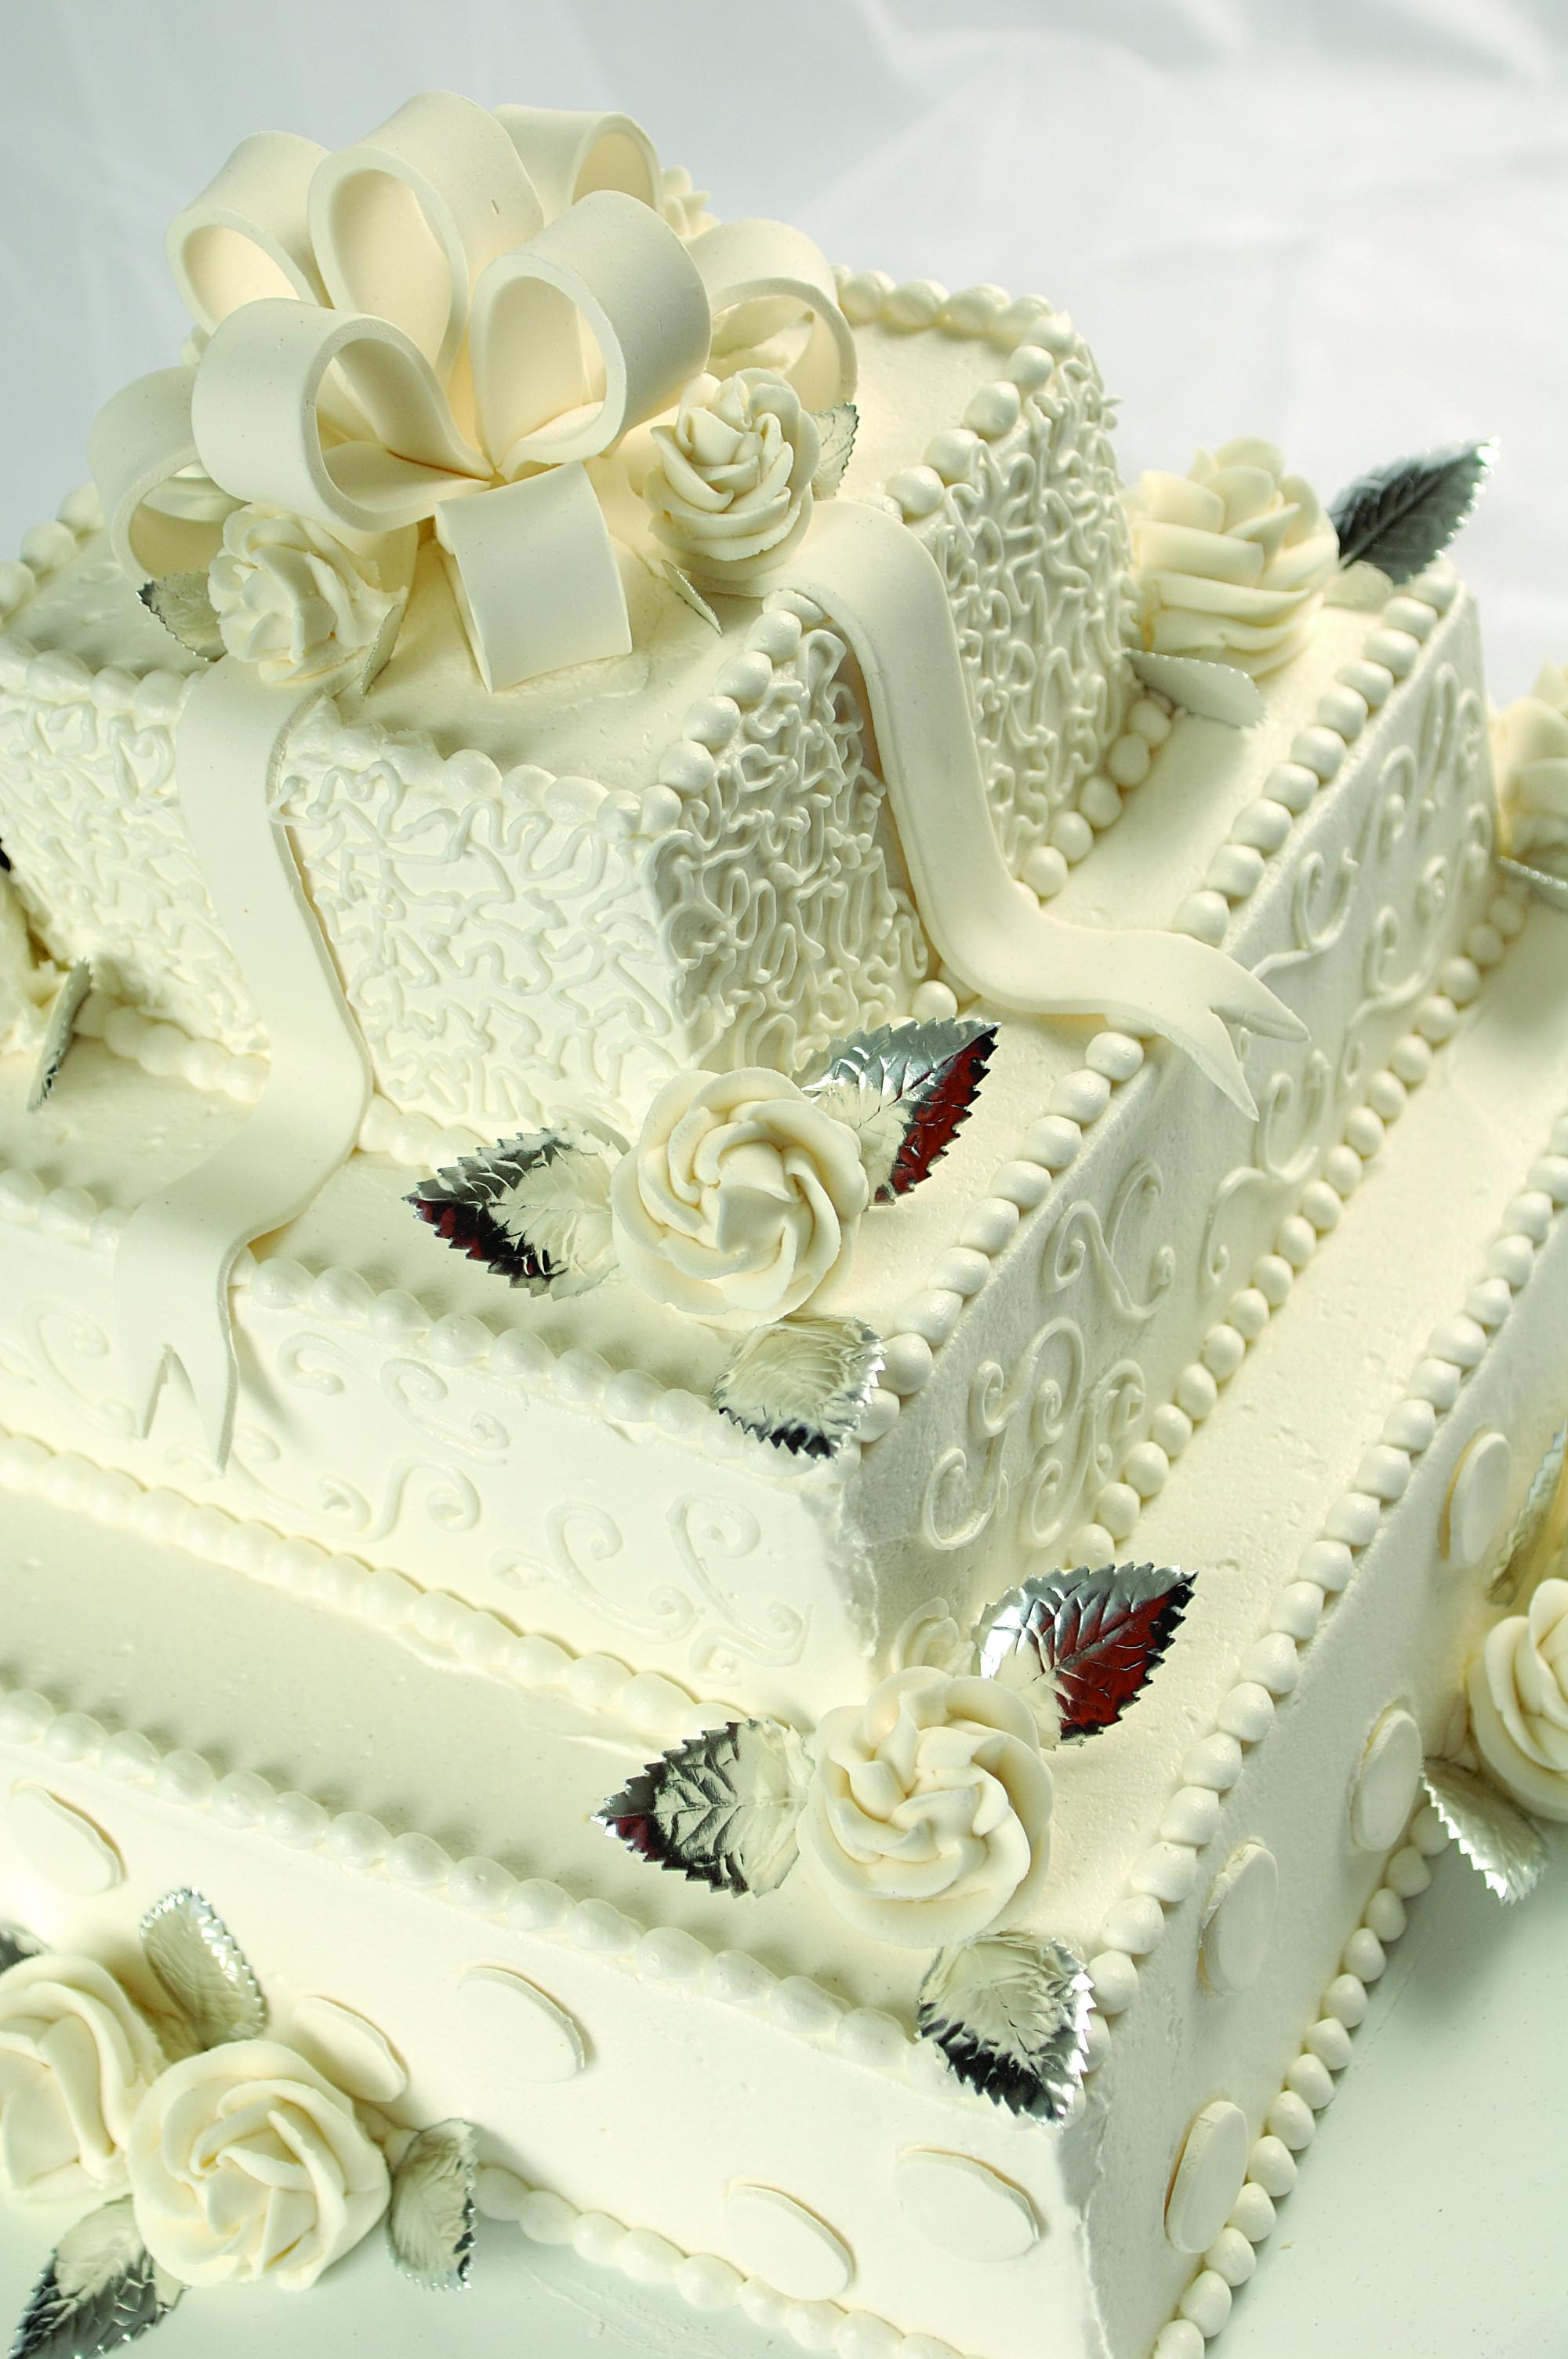 Ukrops Wedding Cakes  Ukrops wedding cakes idea in 2017